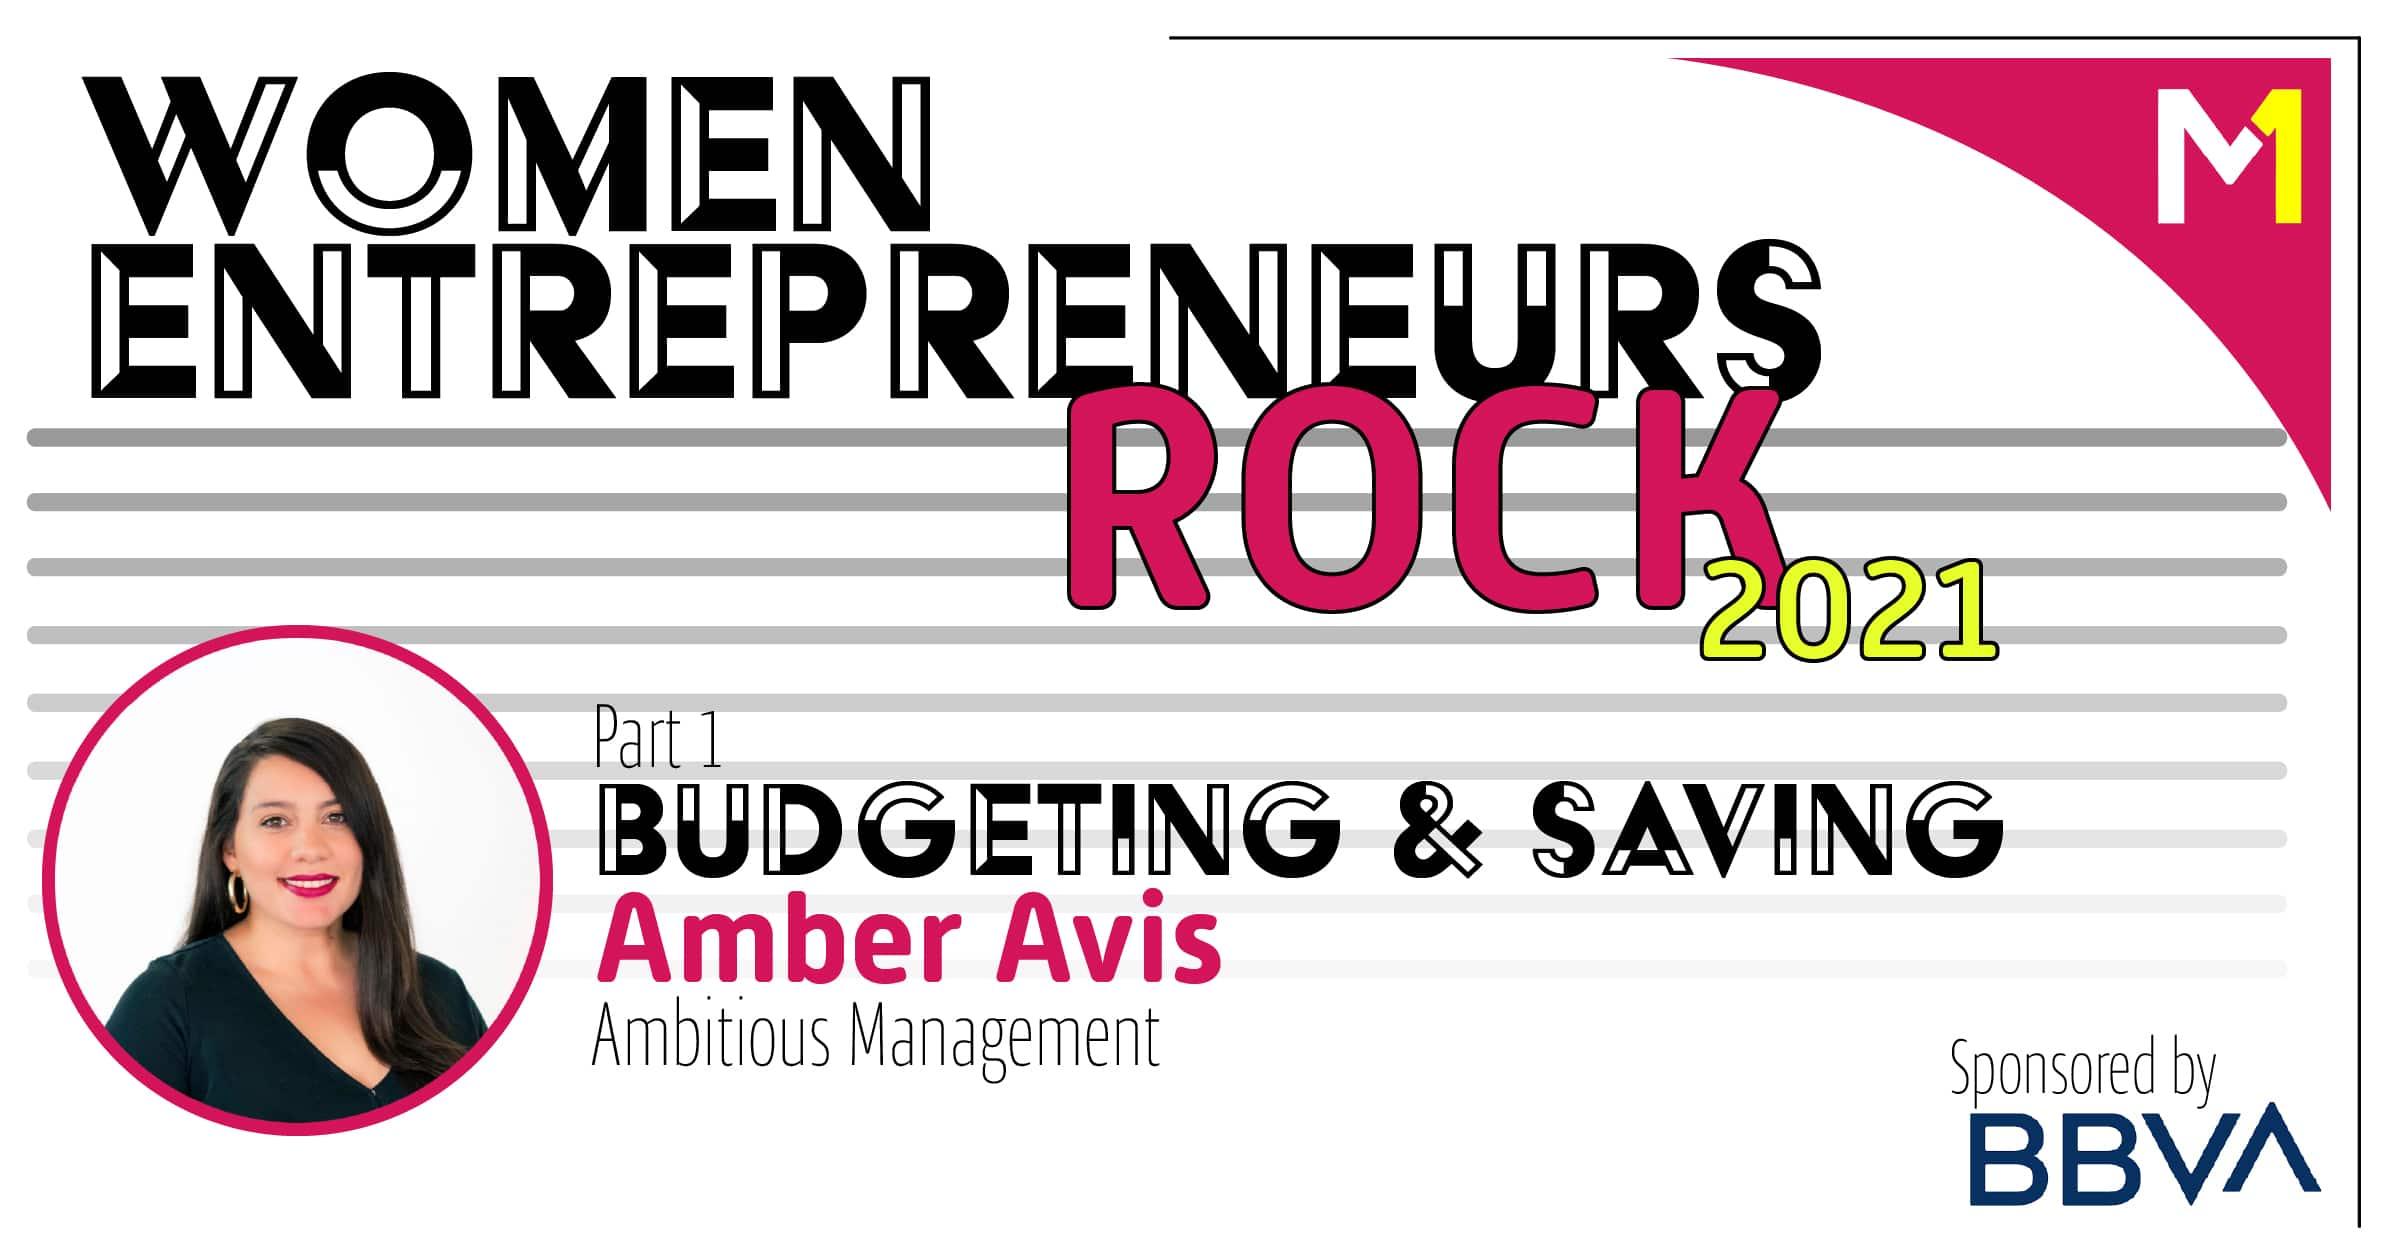 Women Entrepreneurs Rock 2021 Part 1 MileOne